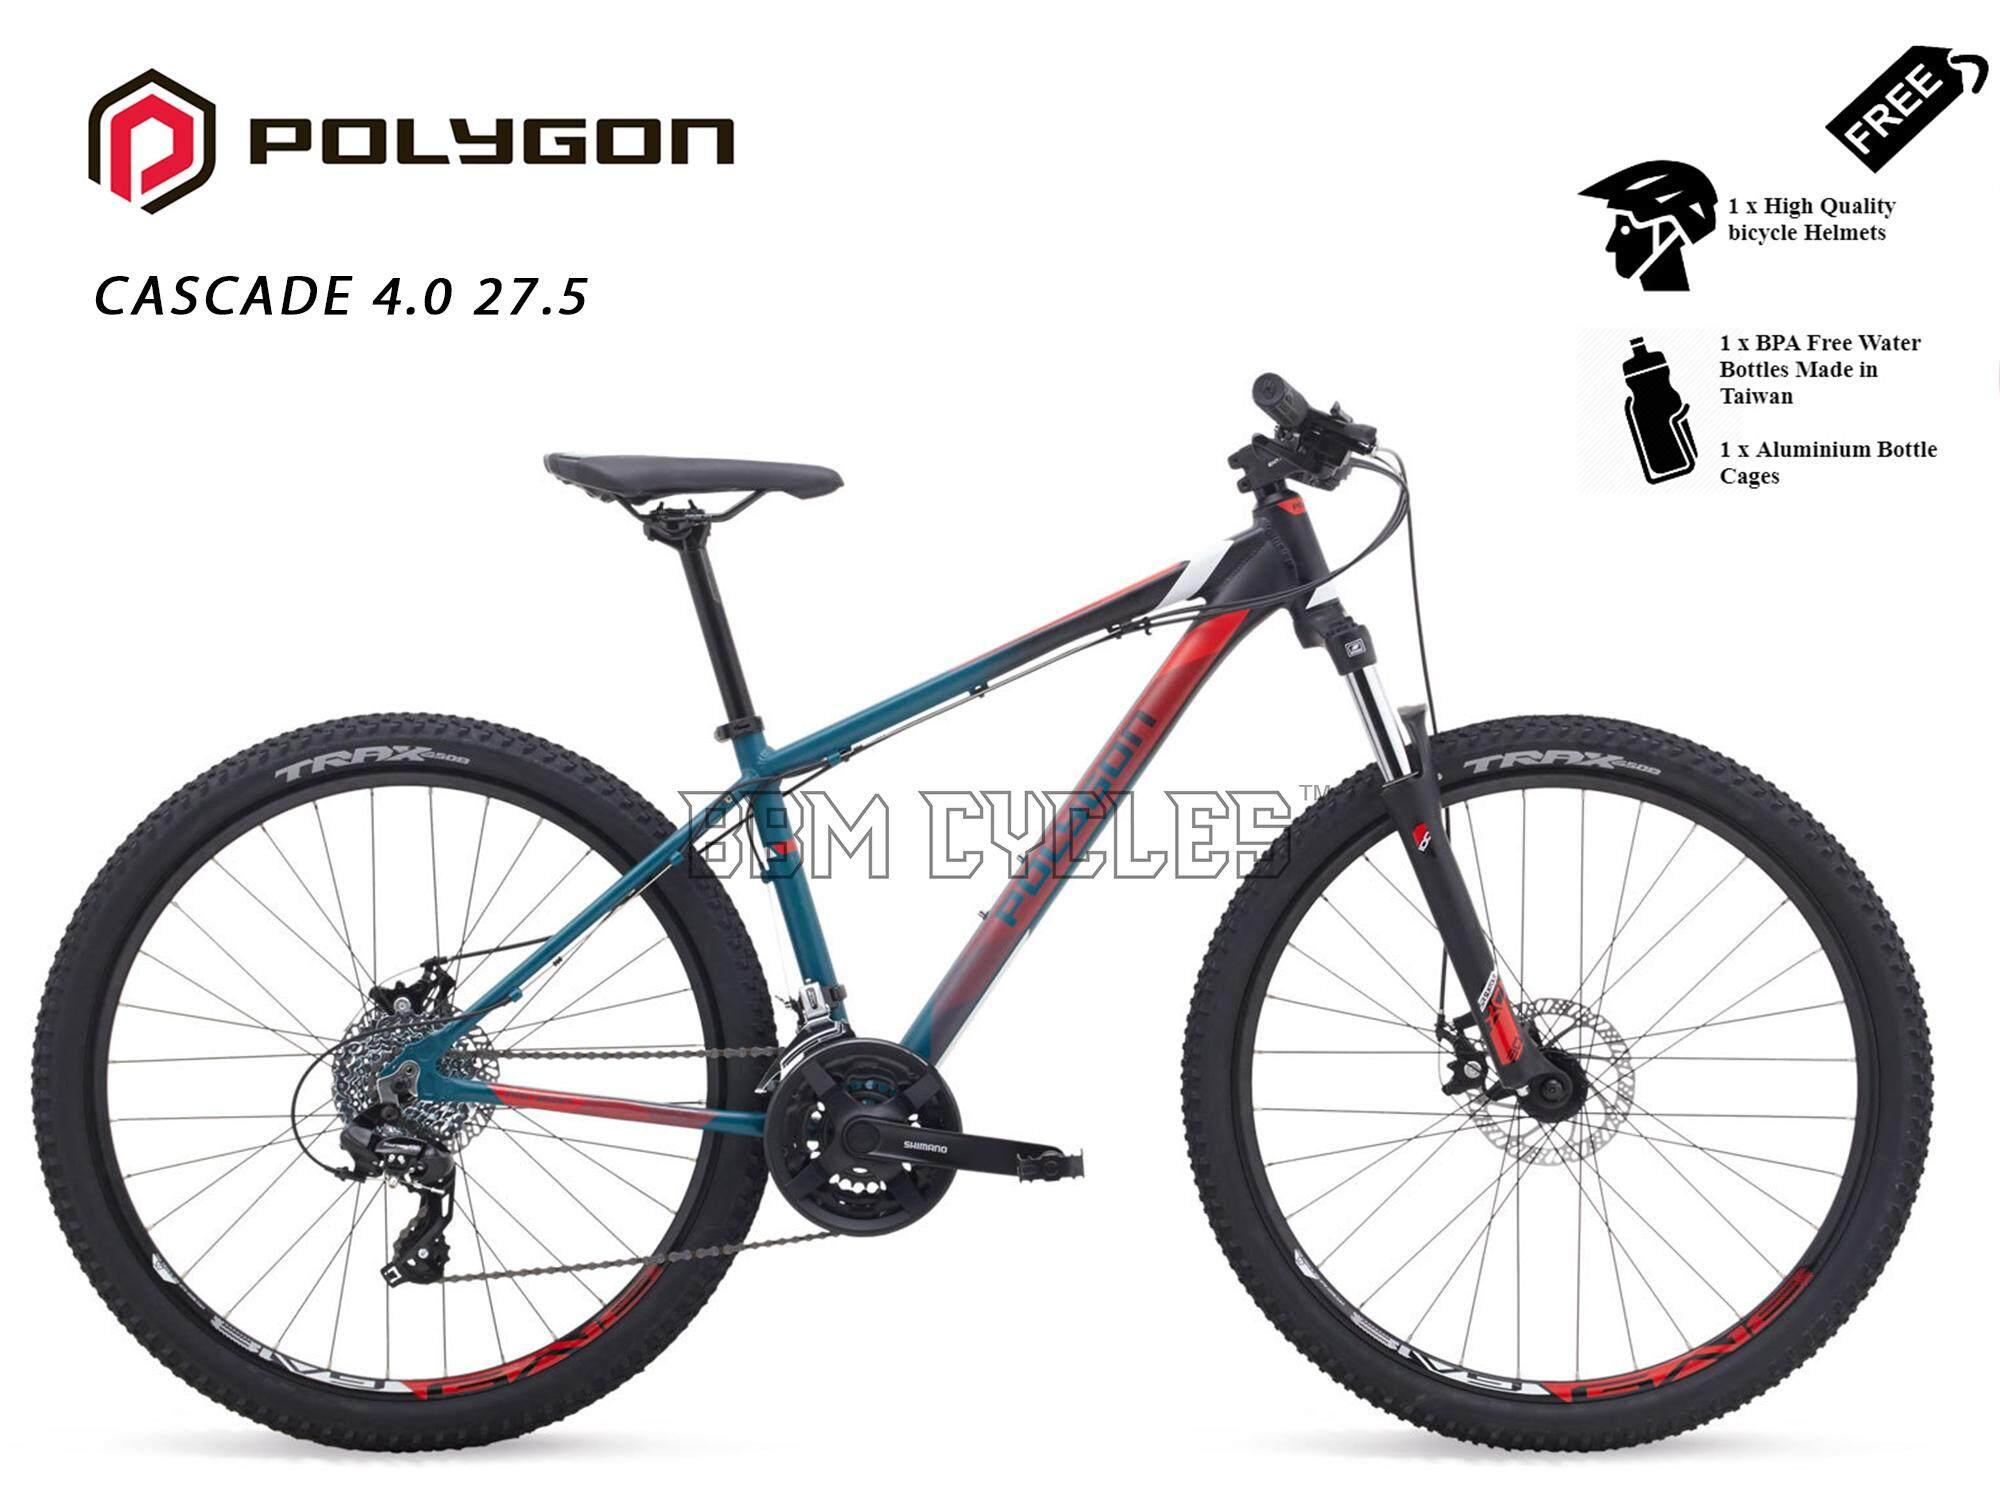 Polygon Cascade 4.0 - 27.5 inch Mountain Bike MODEL 2019 Bio Fit Geometry